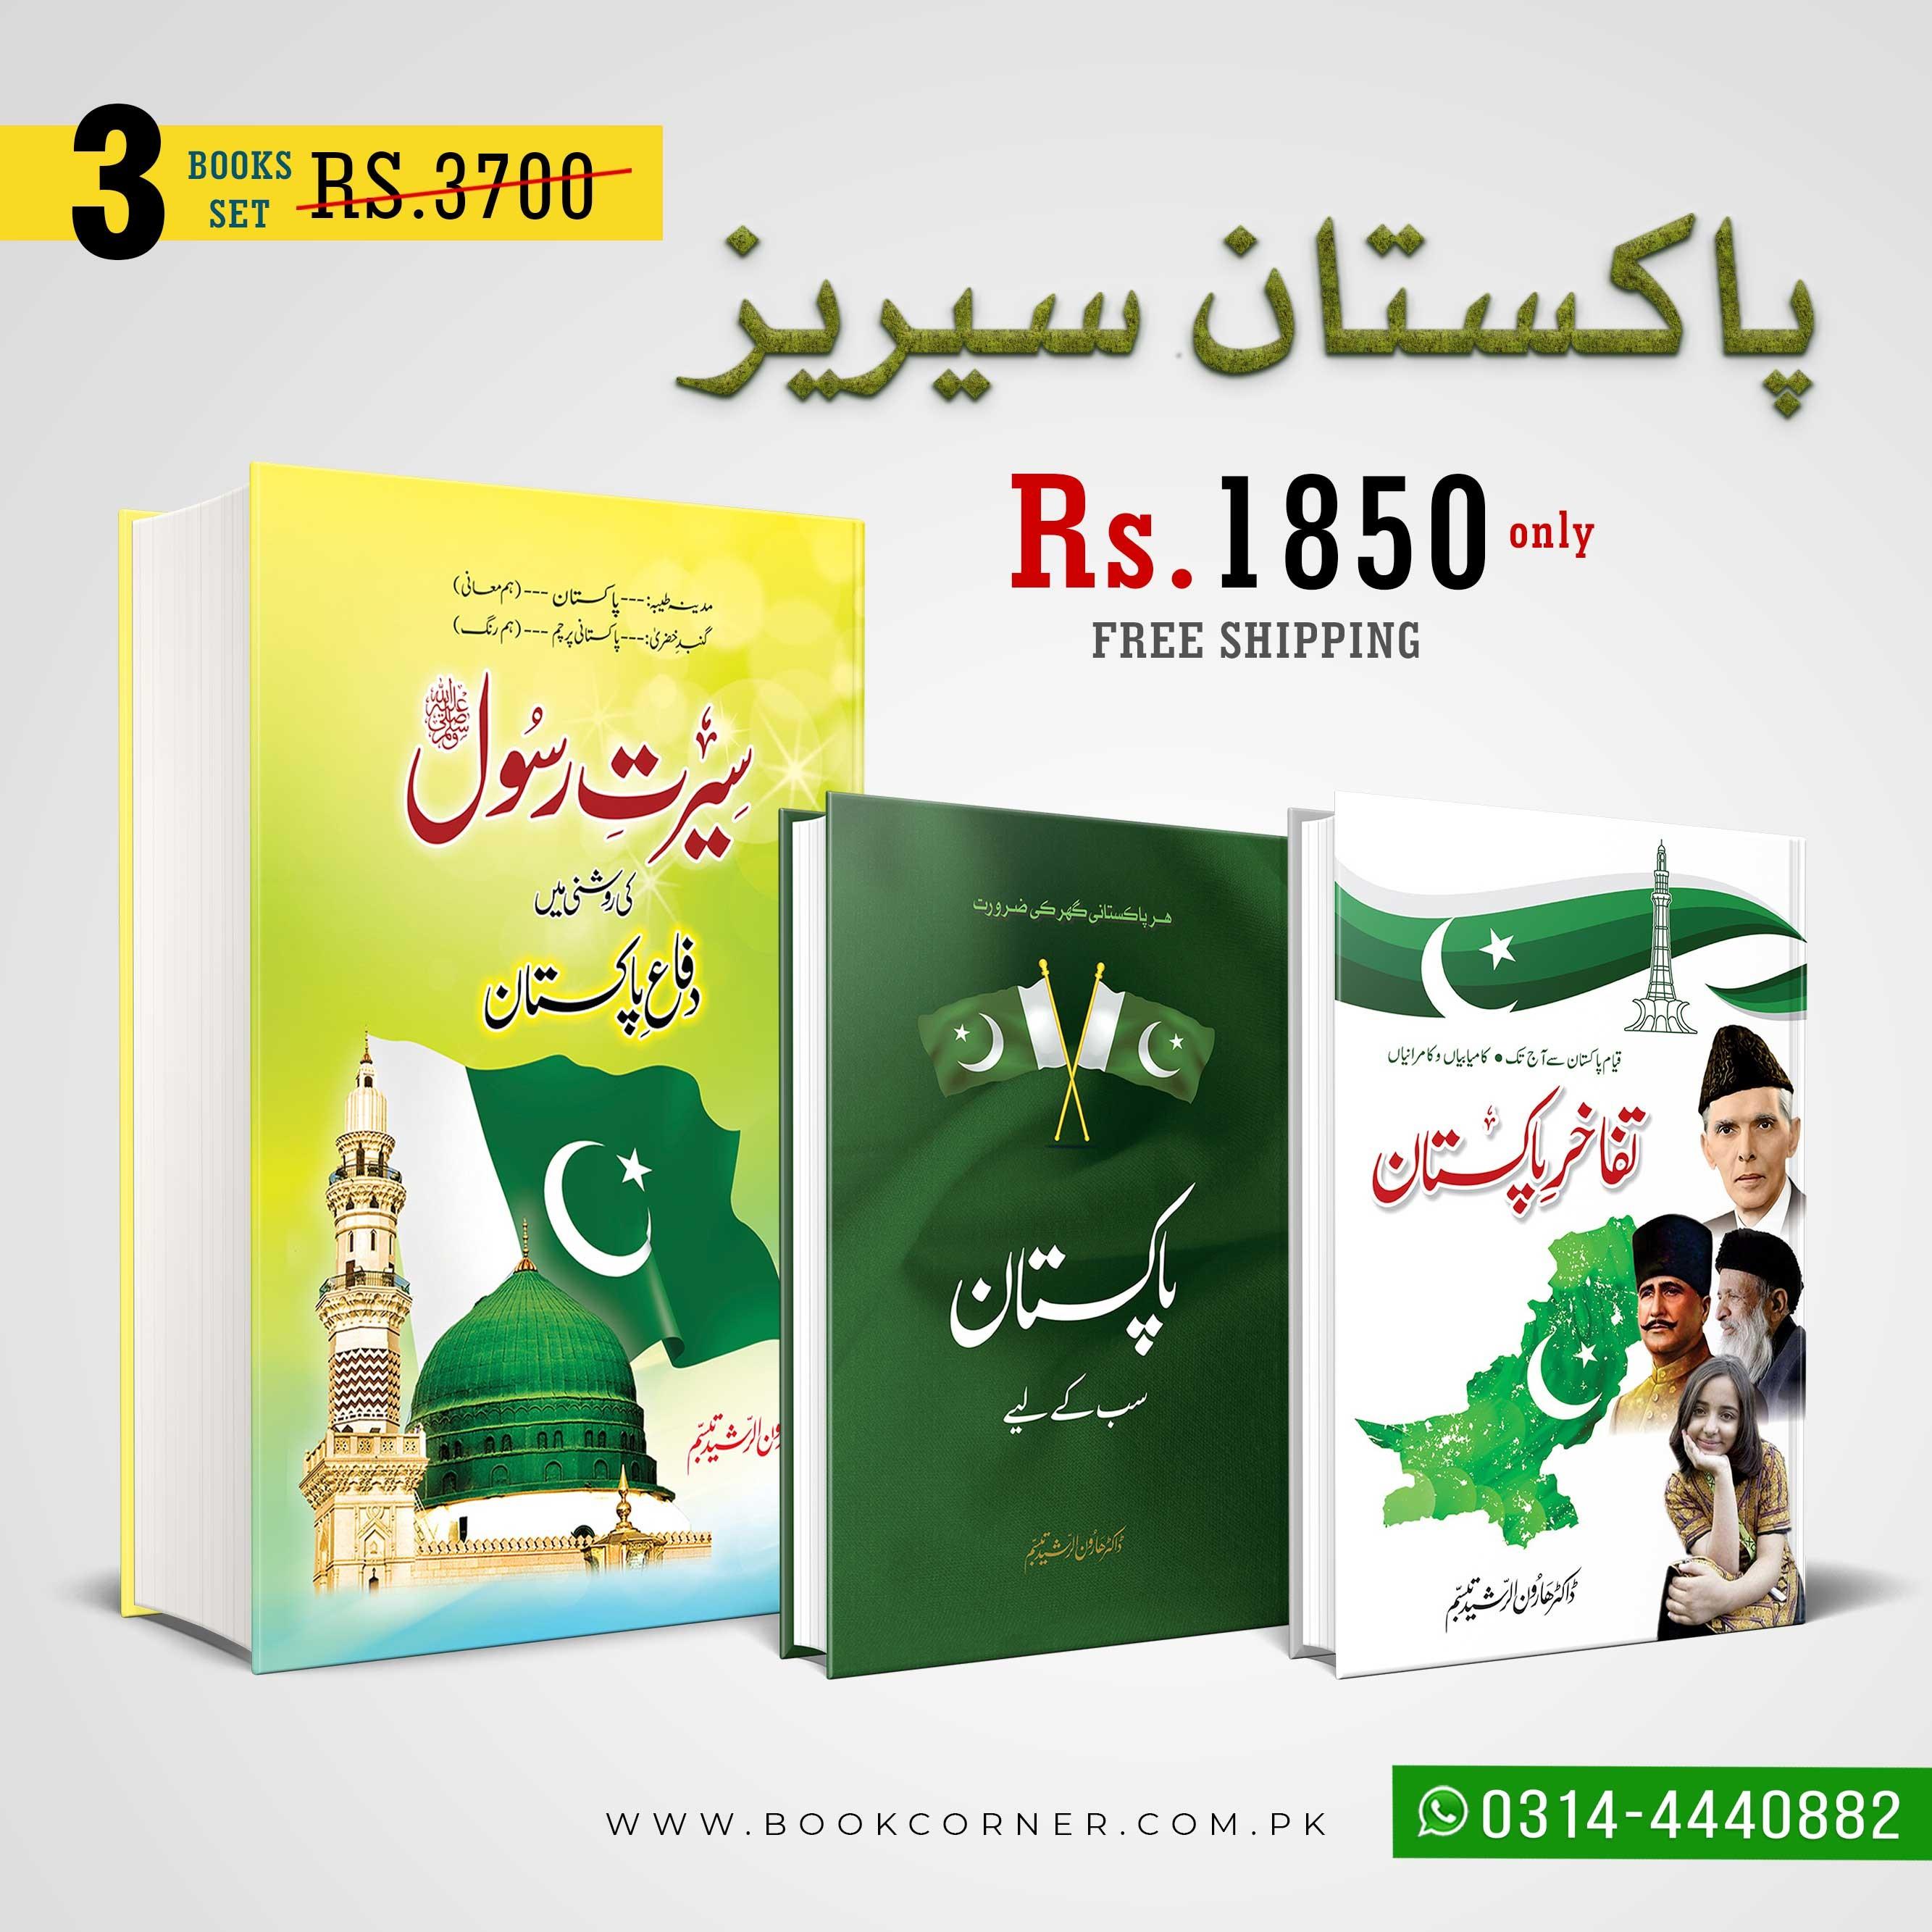 PAKISTAN SERIES   3 BOOKS   BUNDLE OFFER